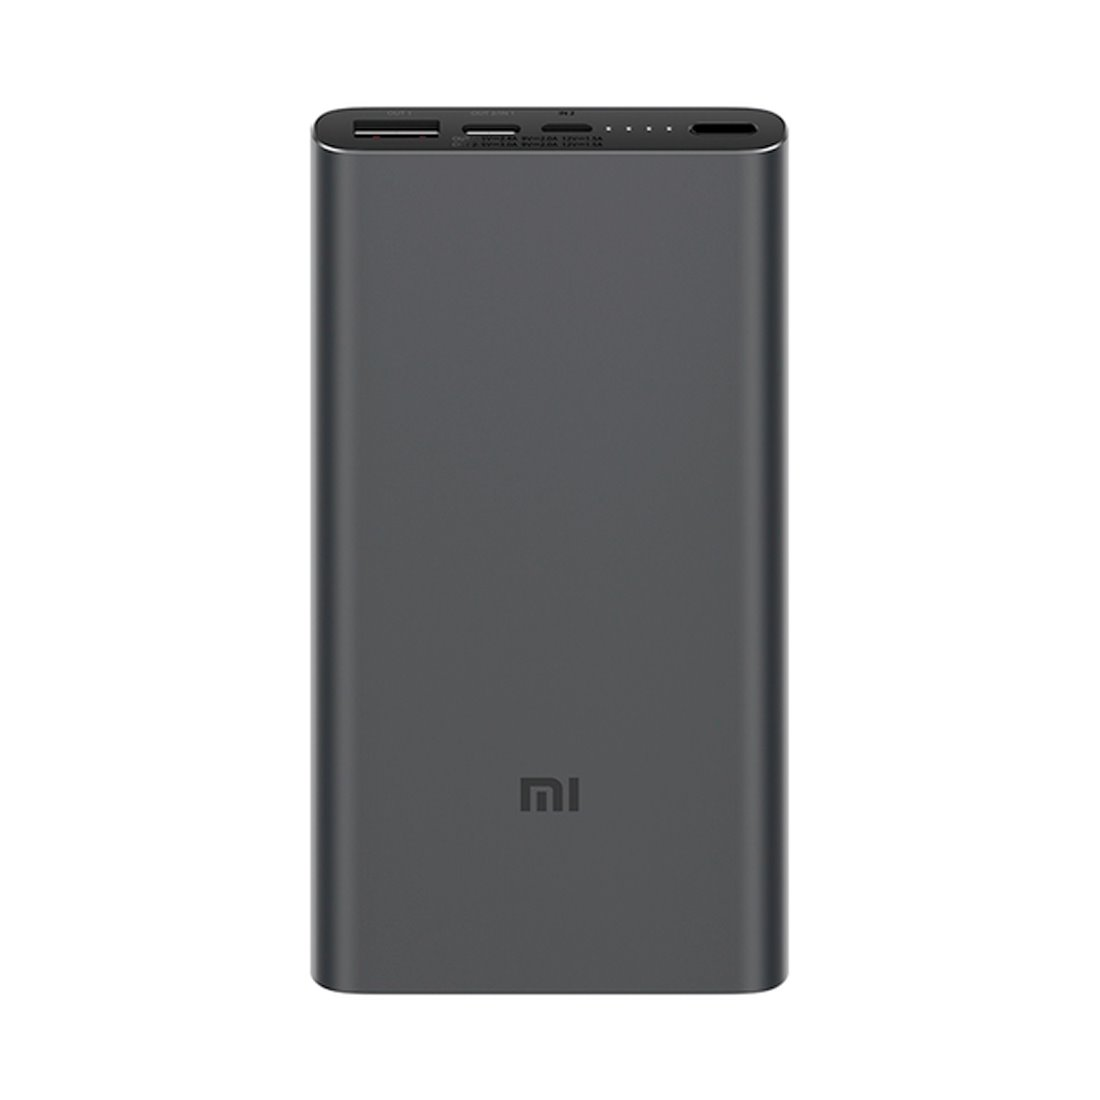 Xiaomi Mi PowerBank 3 Fast Charge 10000mAh Black 6934177711602